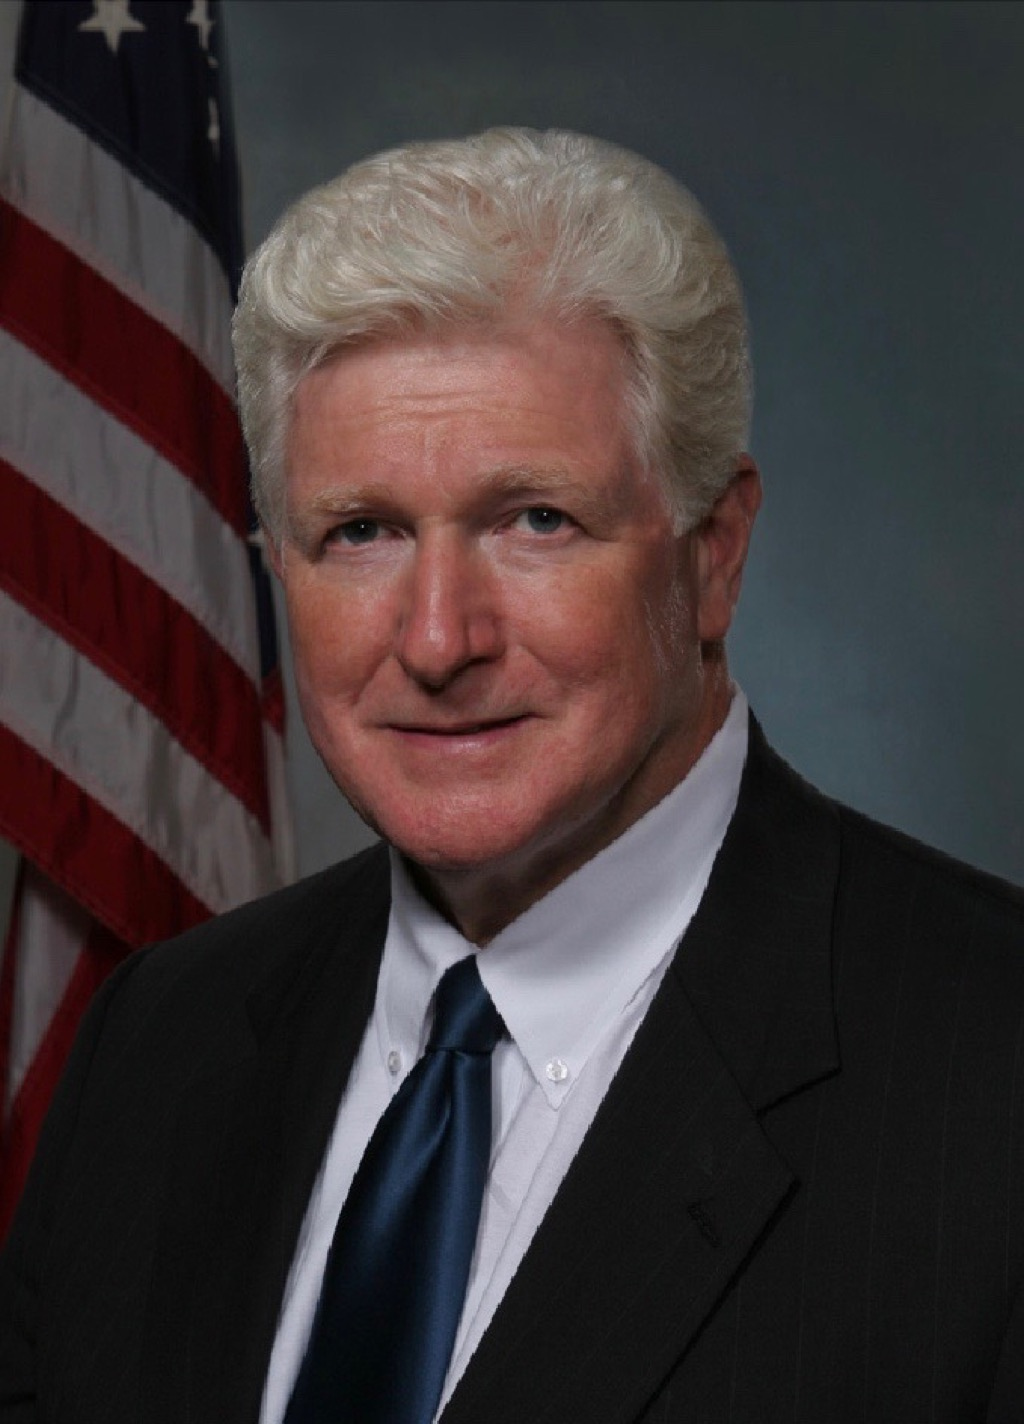 James_Moran_Official_Congressional_Portrait